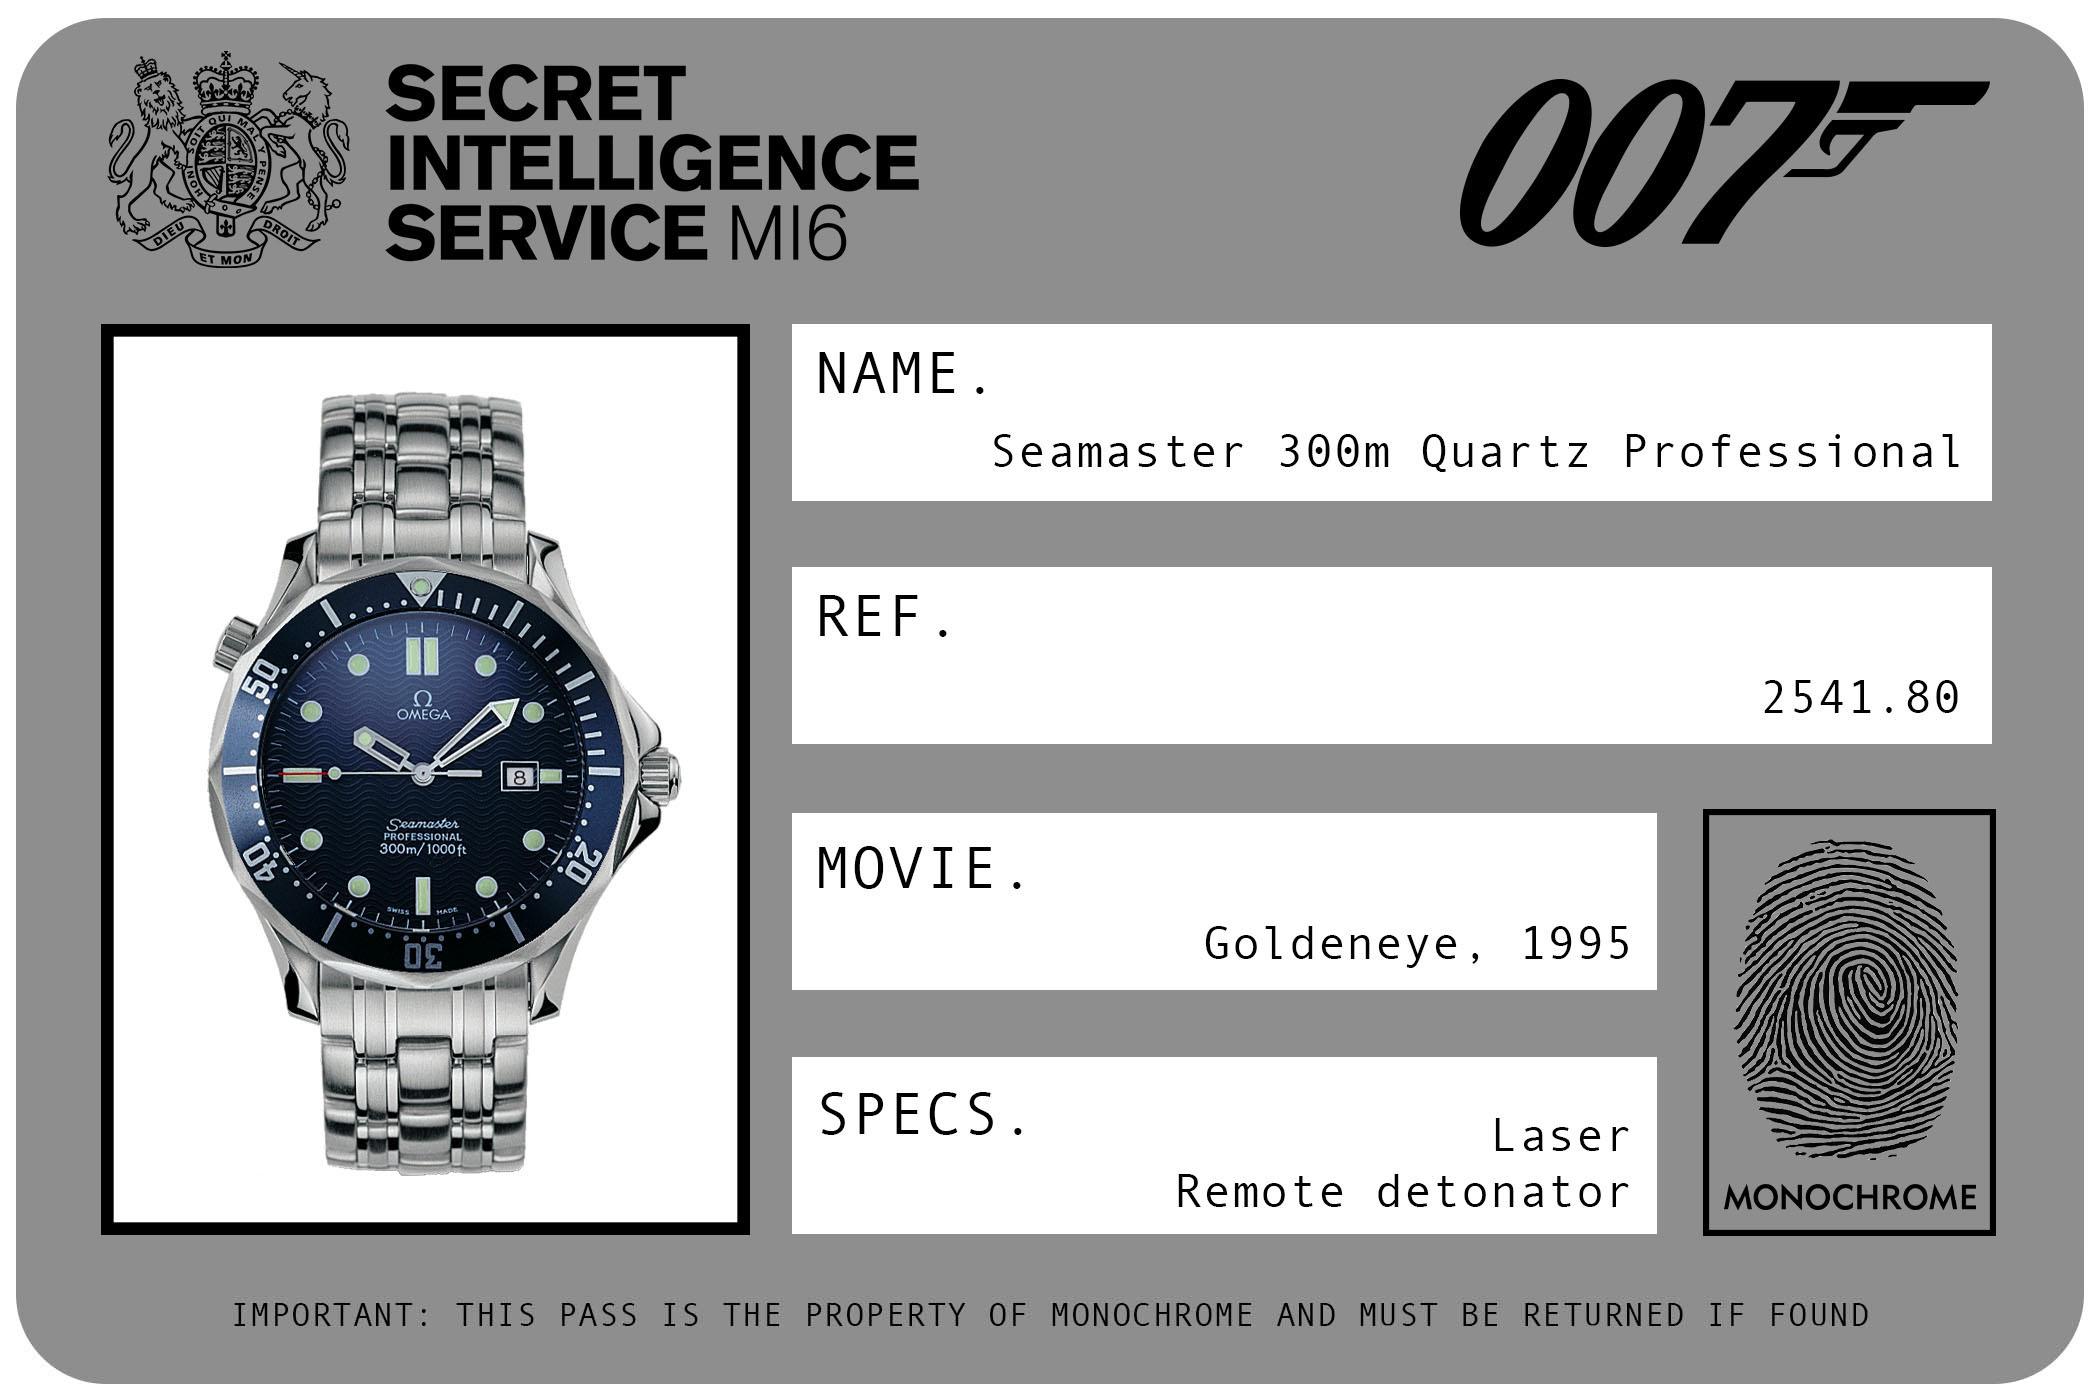 Omega Seamaster 300m Quartz Professional 2541.80 James Bond Goldeneye ID Card 1995